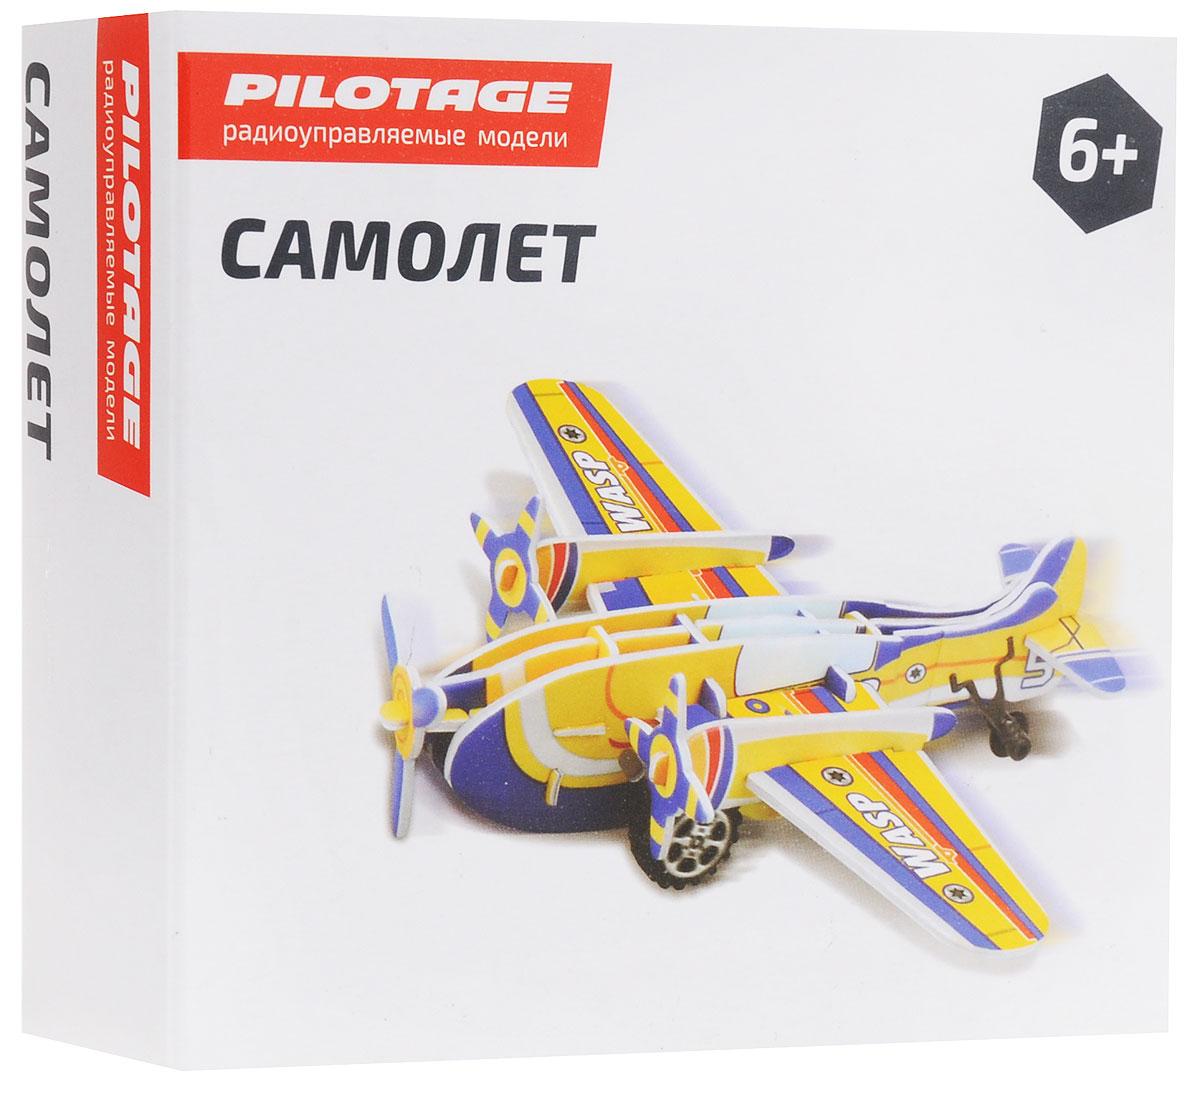 Pilotage 3D Пазл Самолет цвет желтый